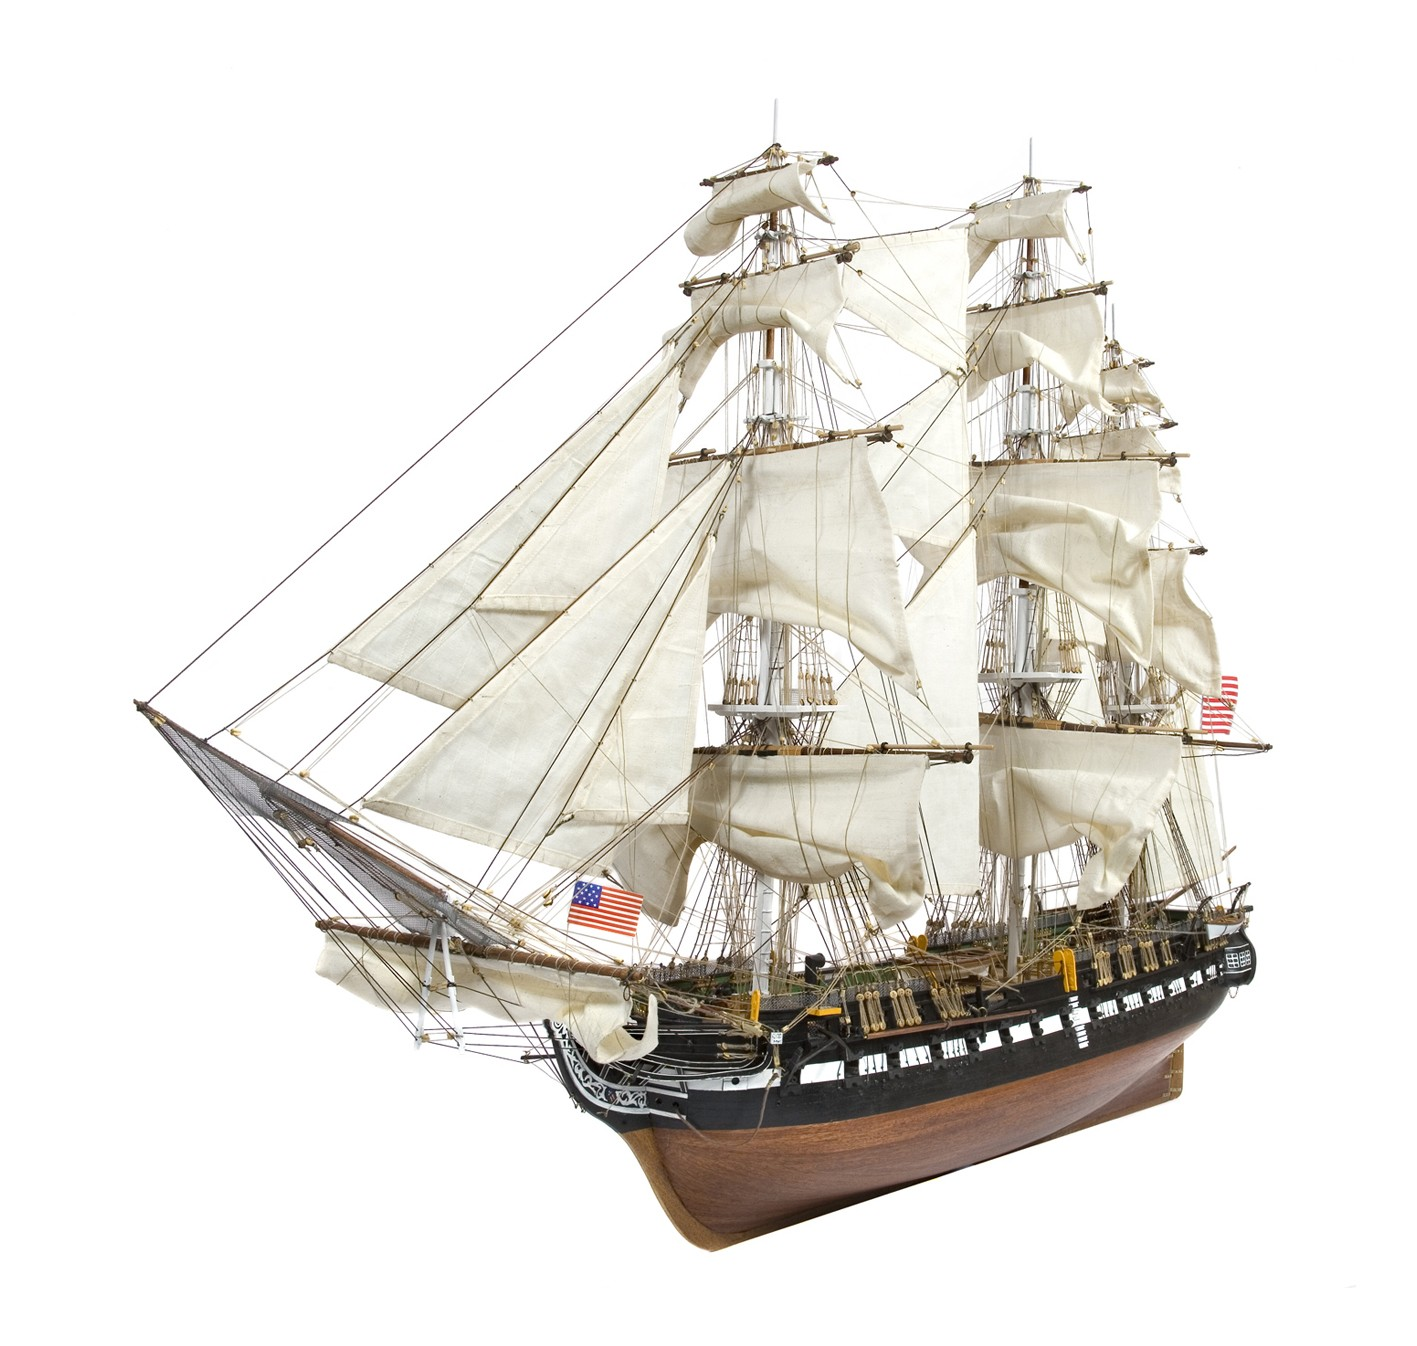 1:76 Scale Model Ship